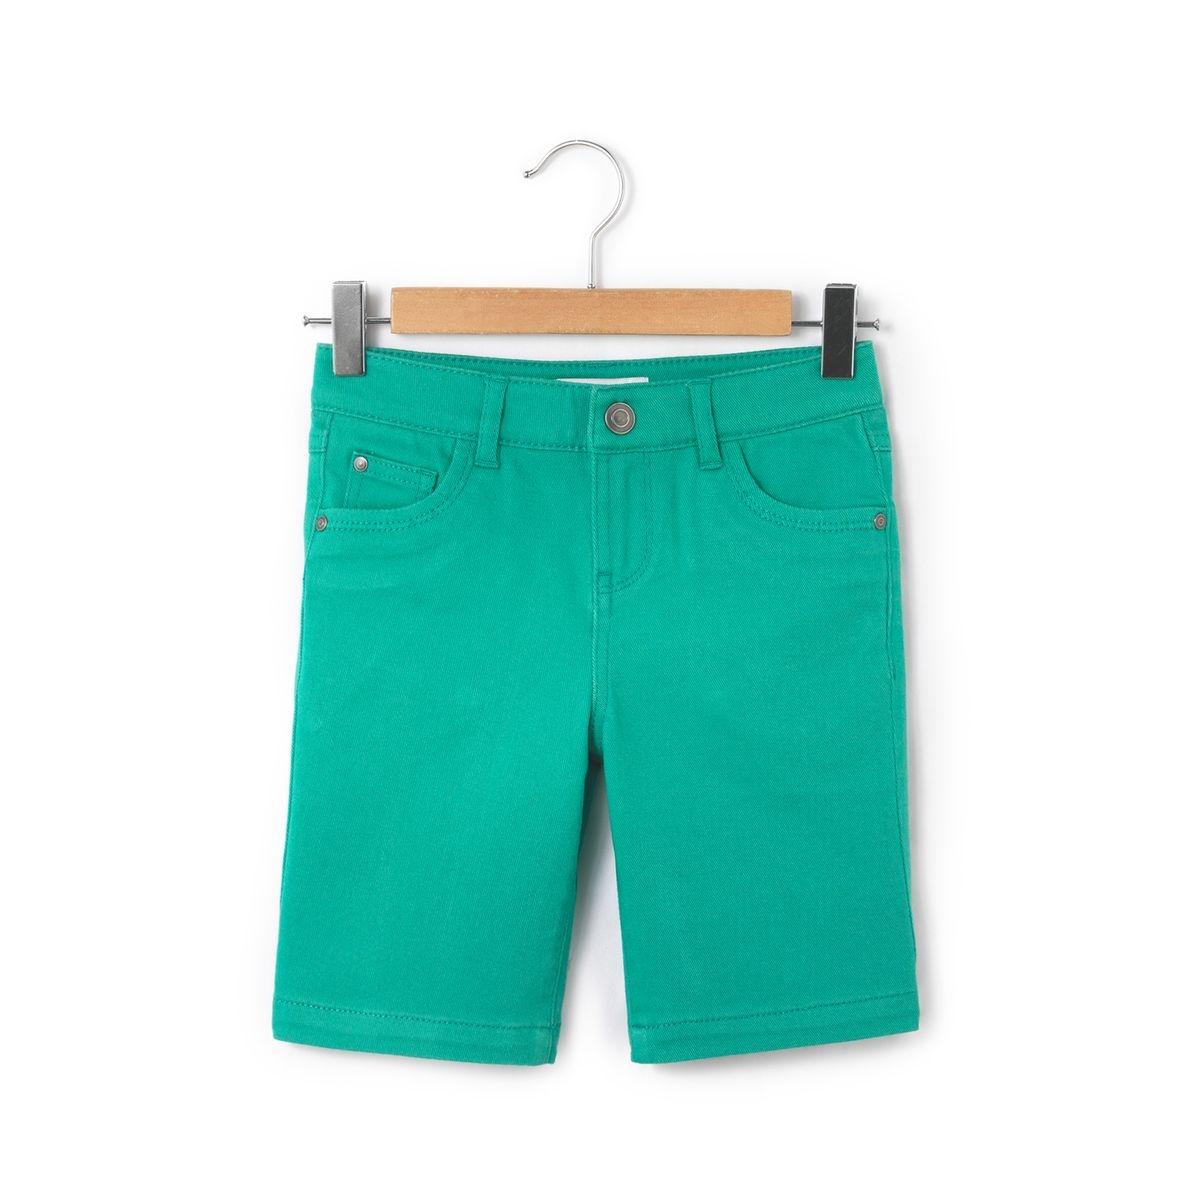 Bermuda 5 poches 3 - 12 ans